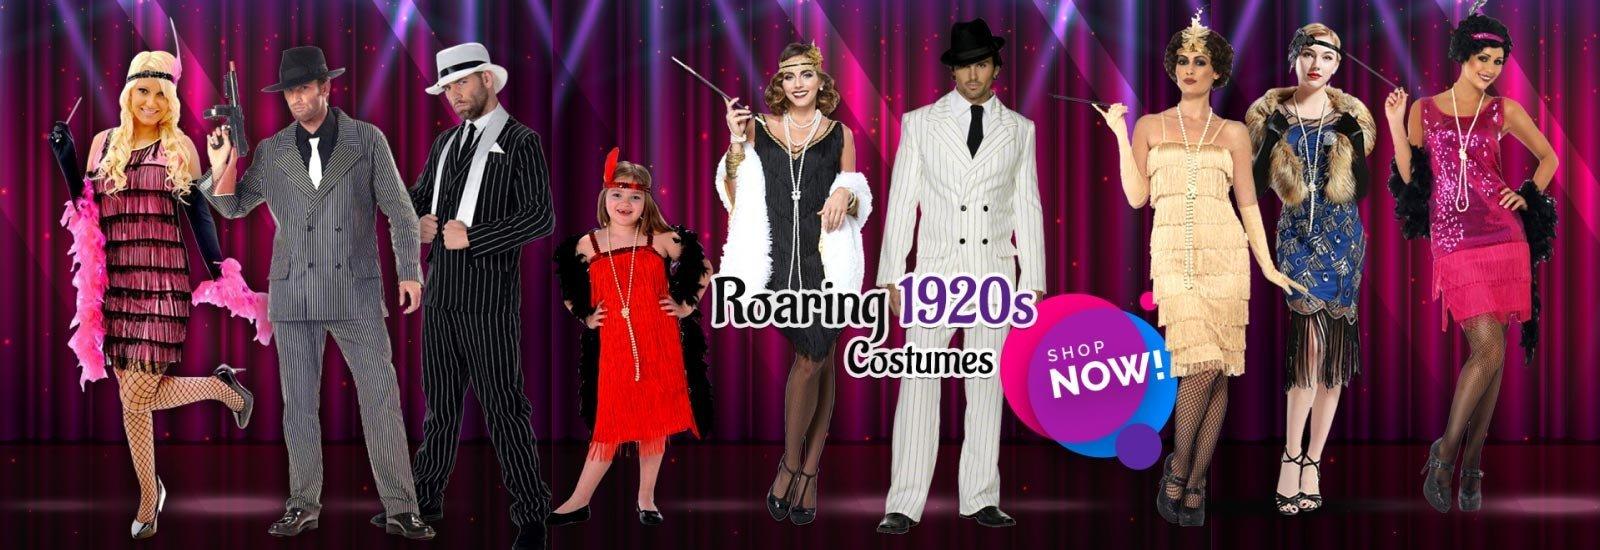 1920S Flapper Costumes